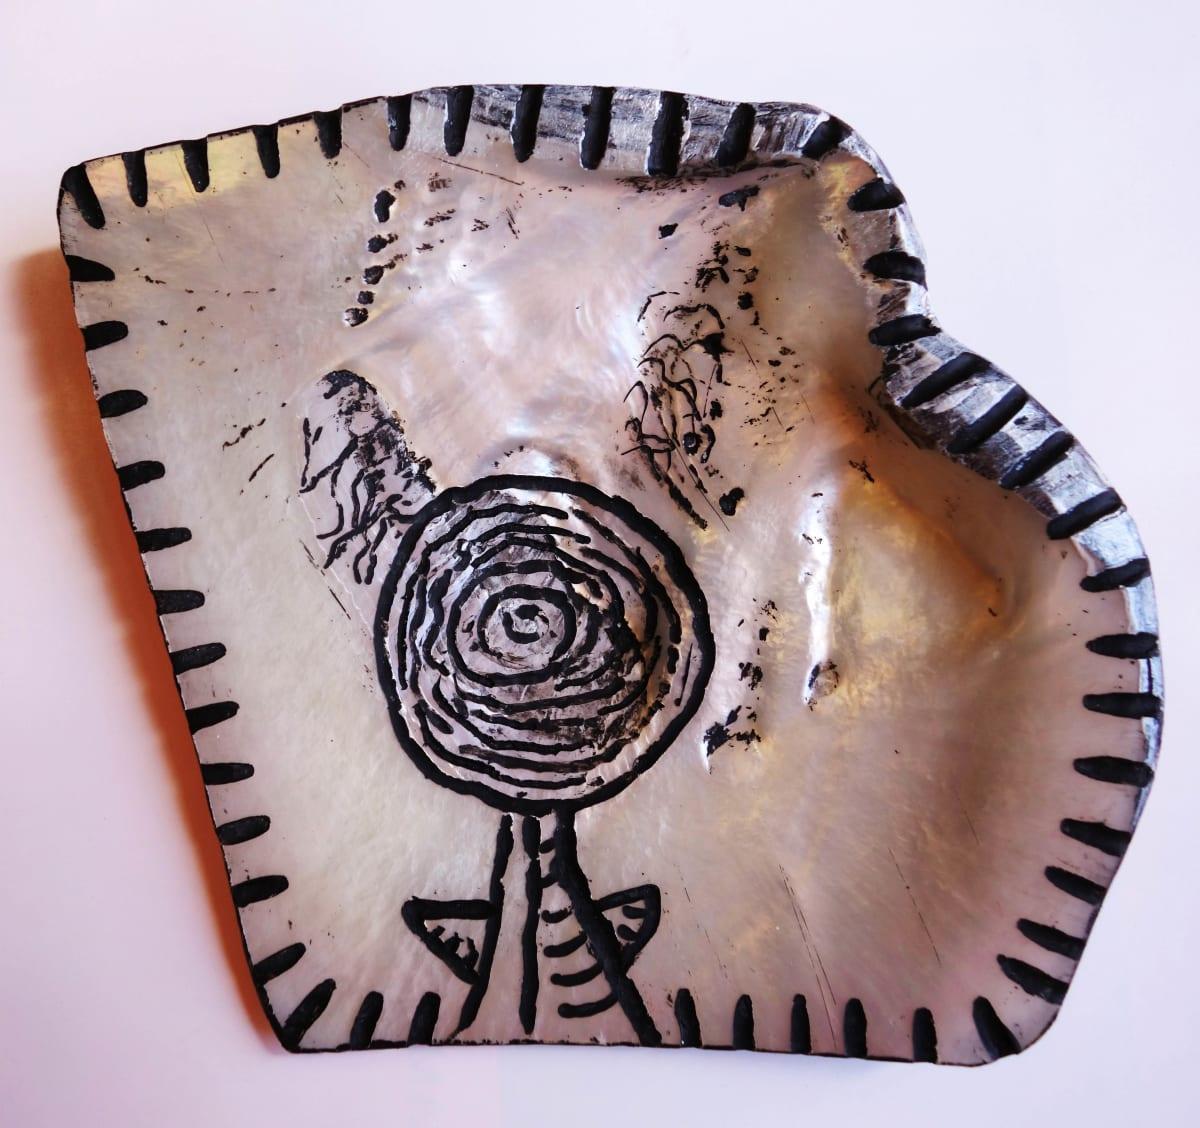 Stephen Eastaugh SHELL-3, 2015 Pearl shell and acrylic